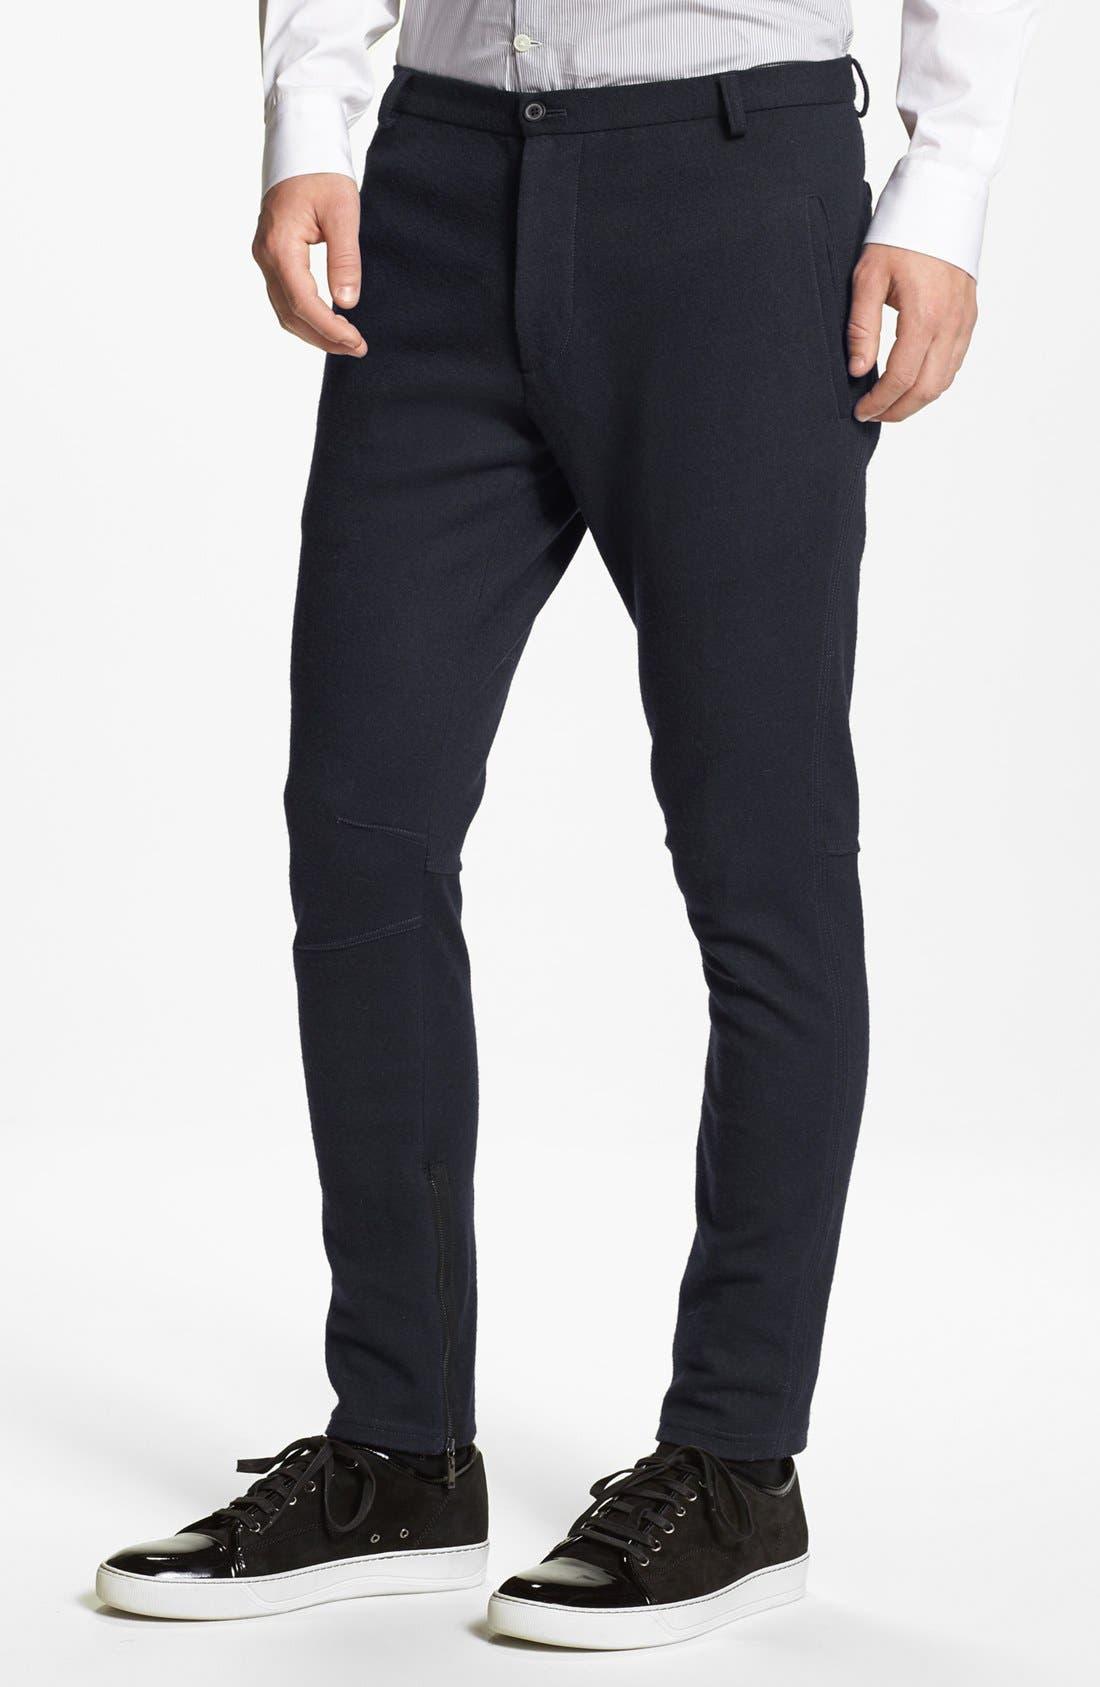 Main Image - Lanvin Slim Fit Stretch Pants